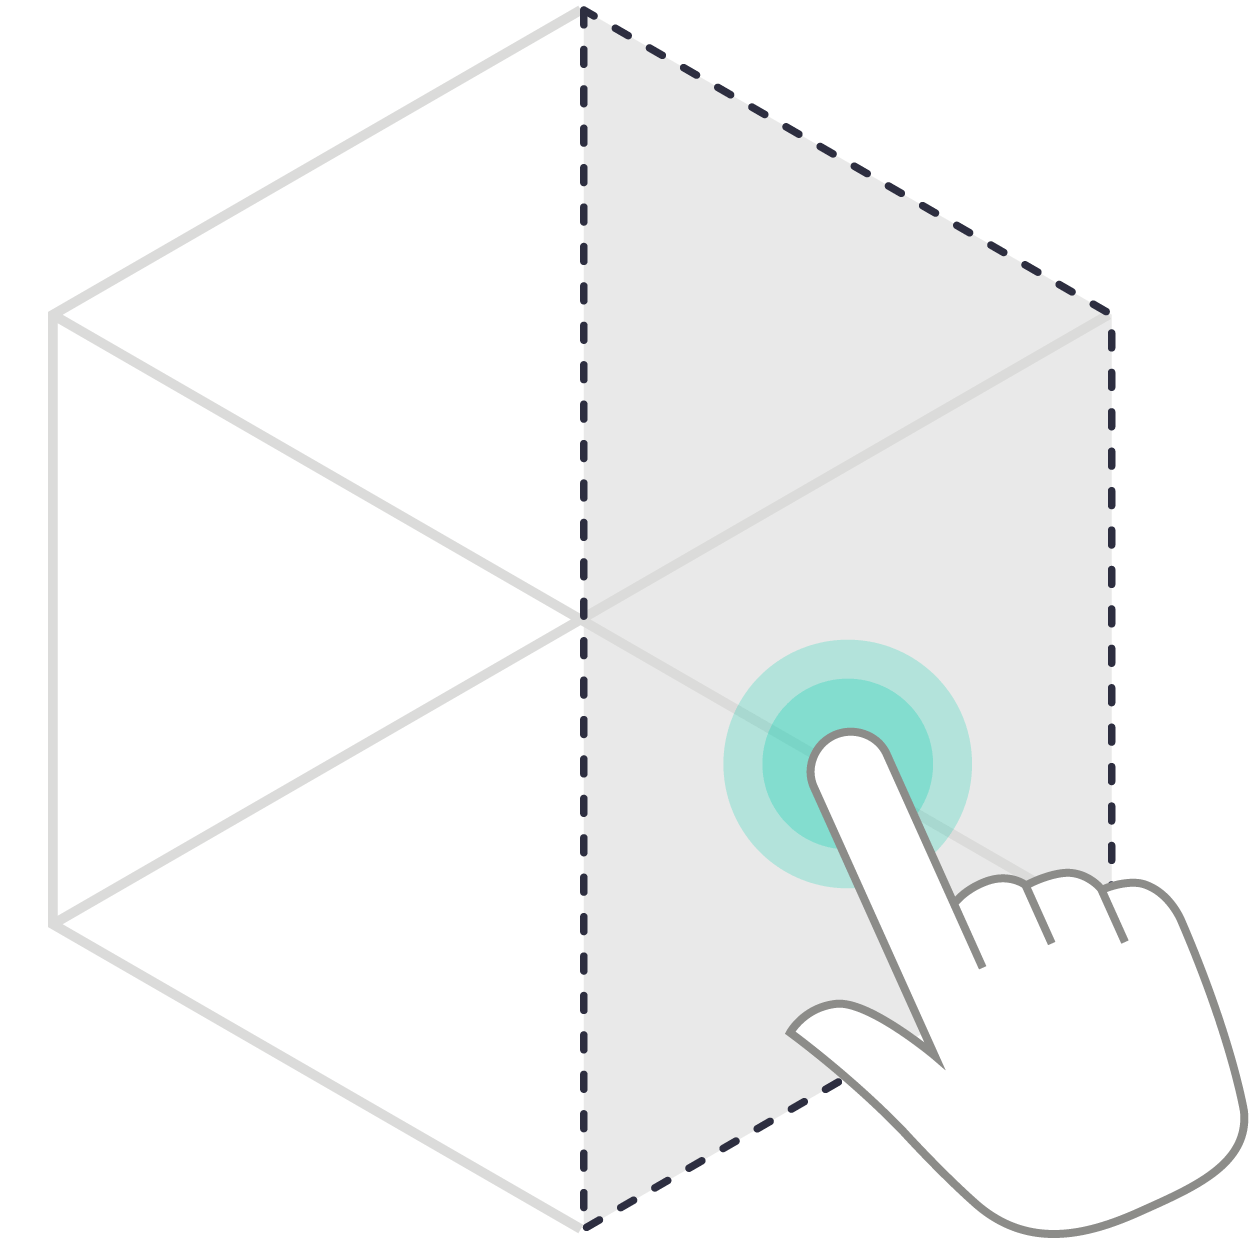 game-instruction-diagram-edugames-plus-fixate.png